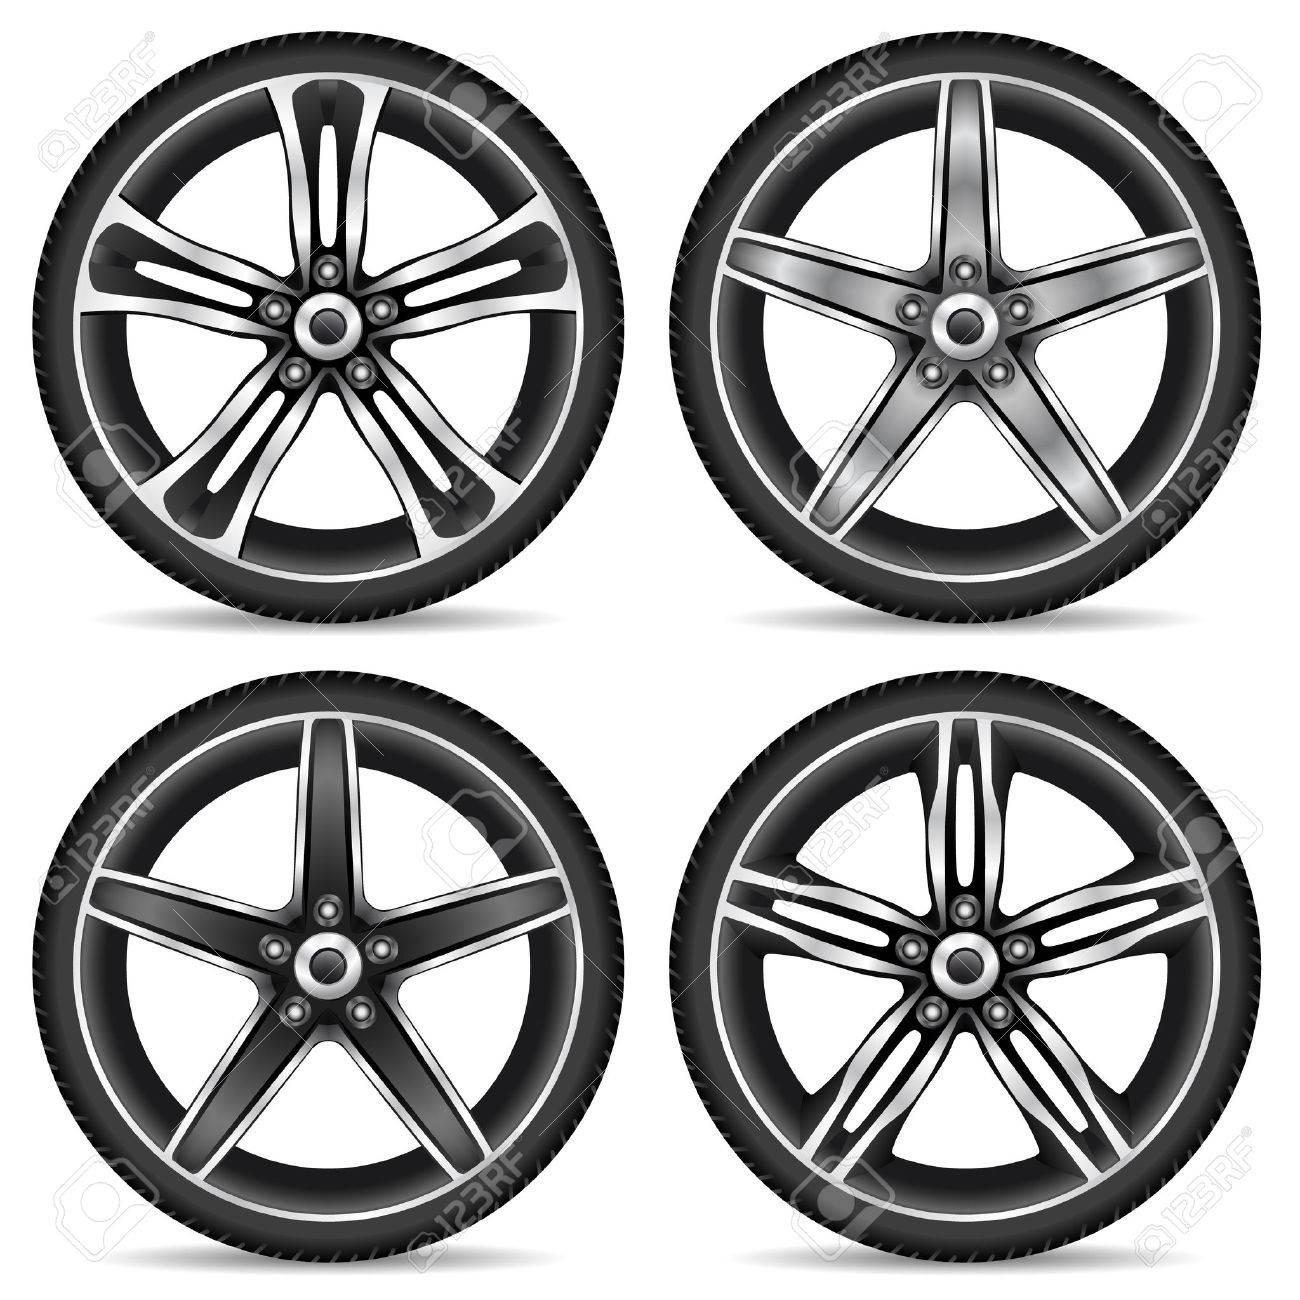 aluminum wheel set Stock Vector - 8576472